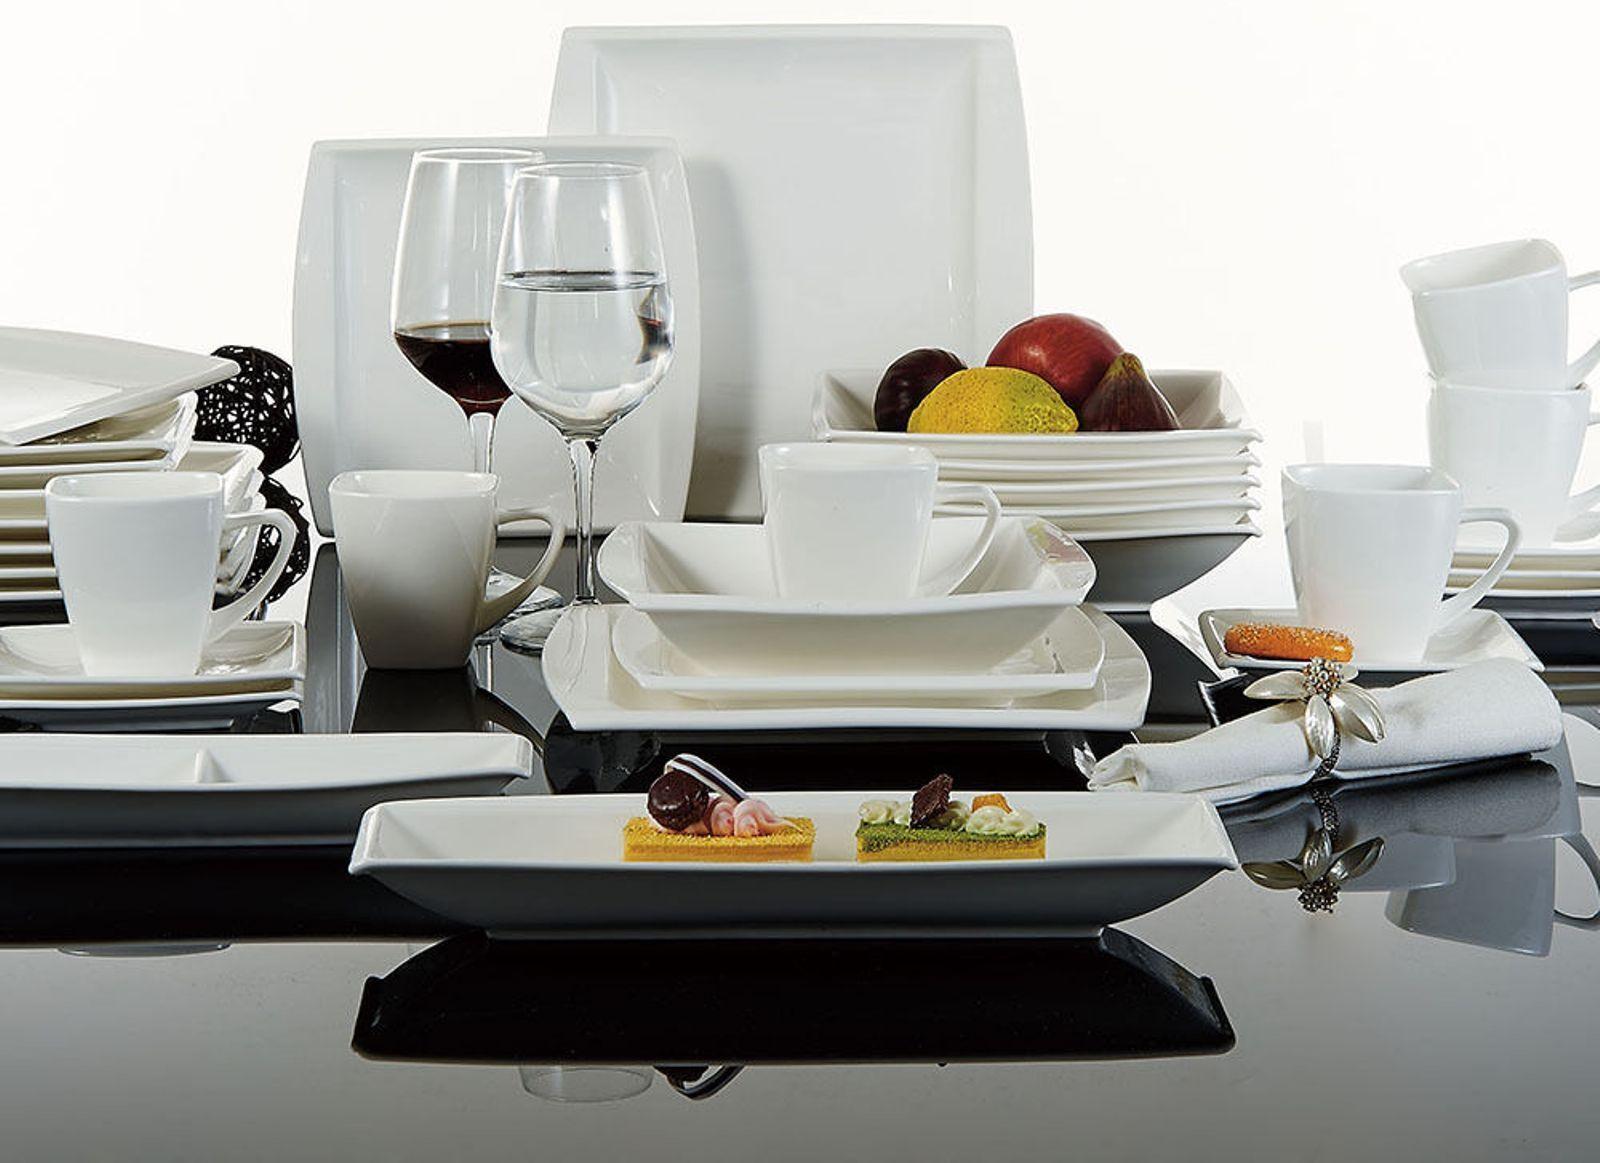 32pc Cena COMPLETO SET IN CERAMICA PIATTI TAZZE PIATTINI CUCINA DINNING Service Set